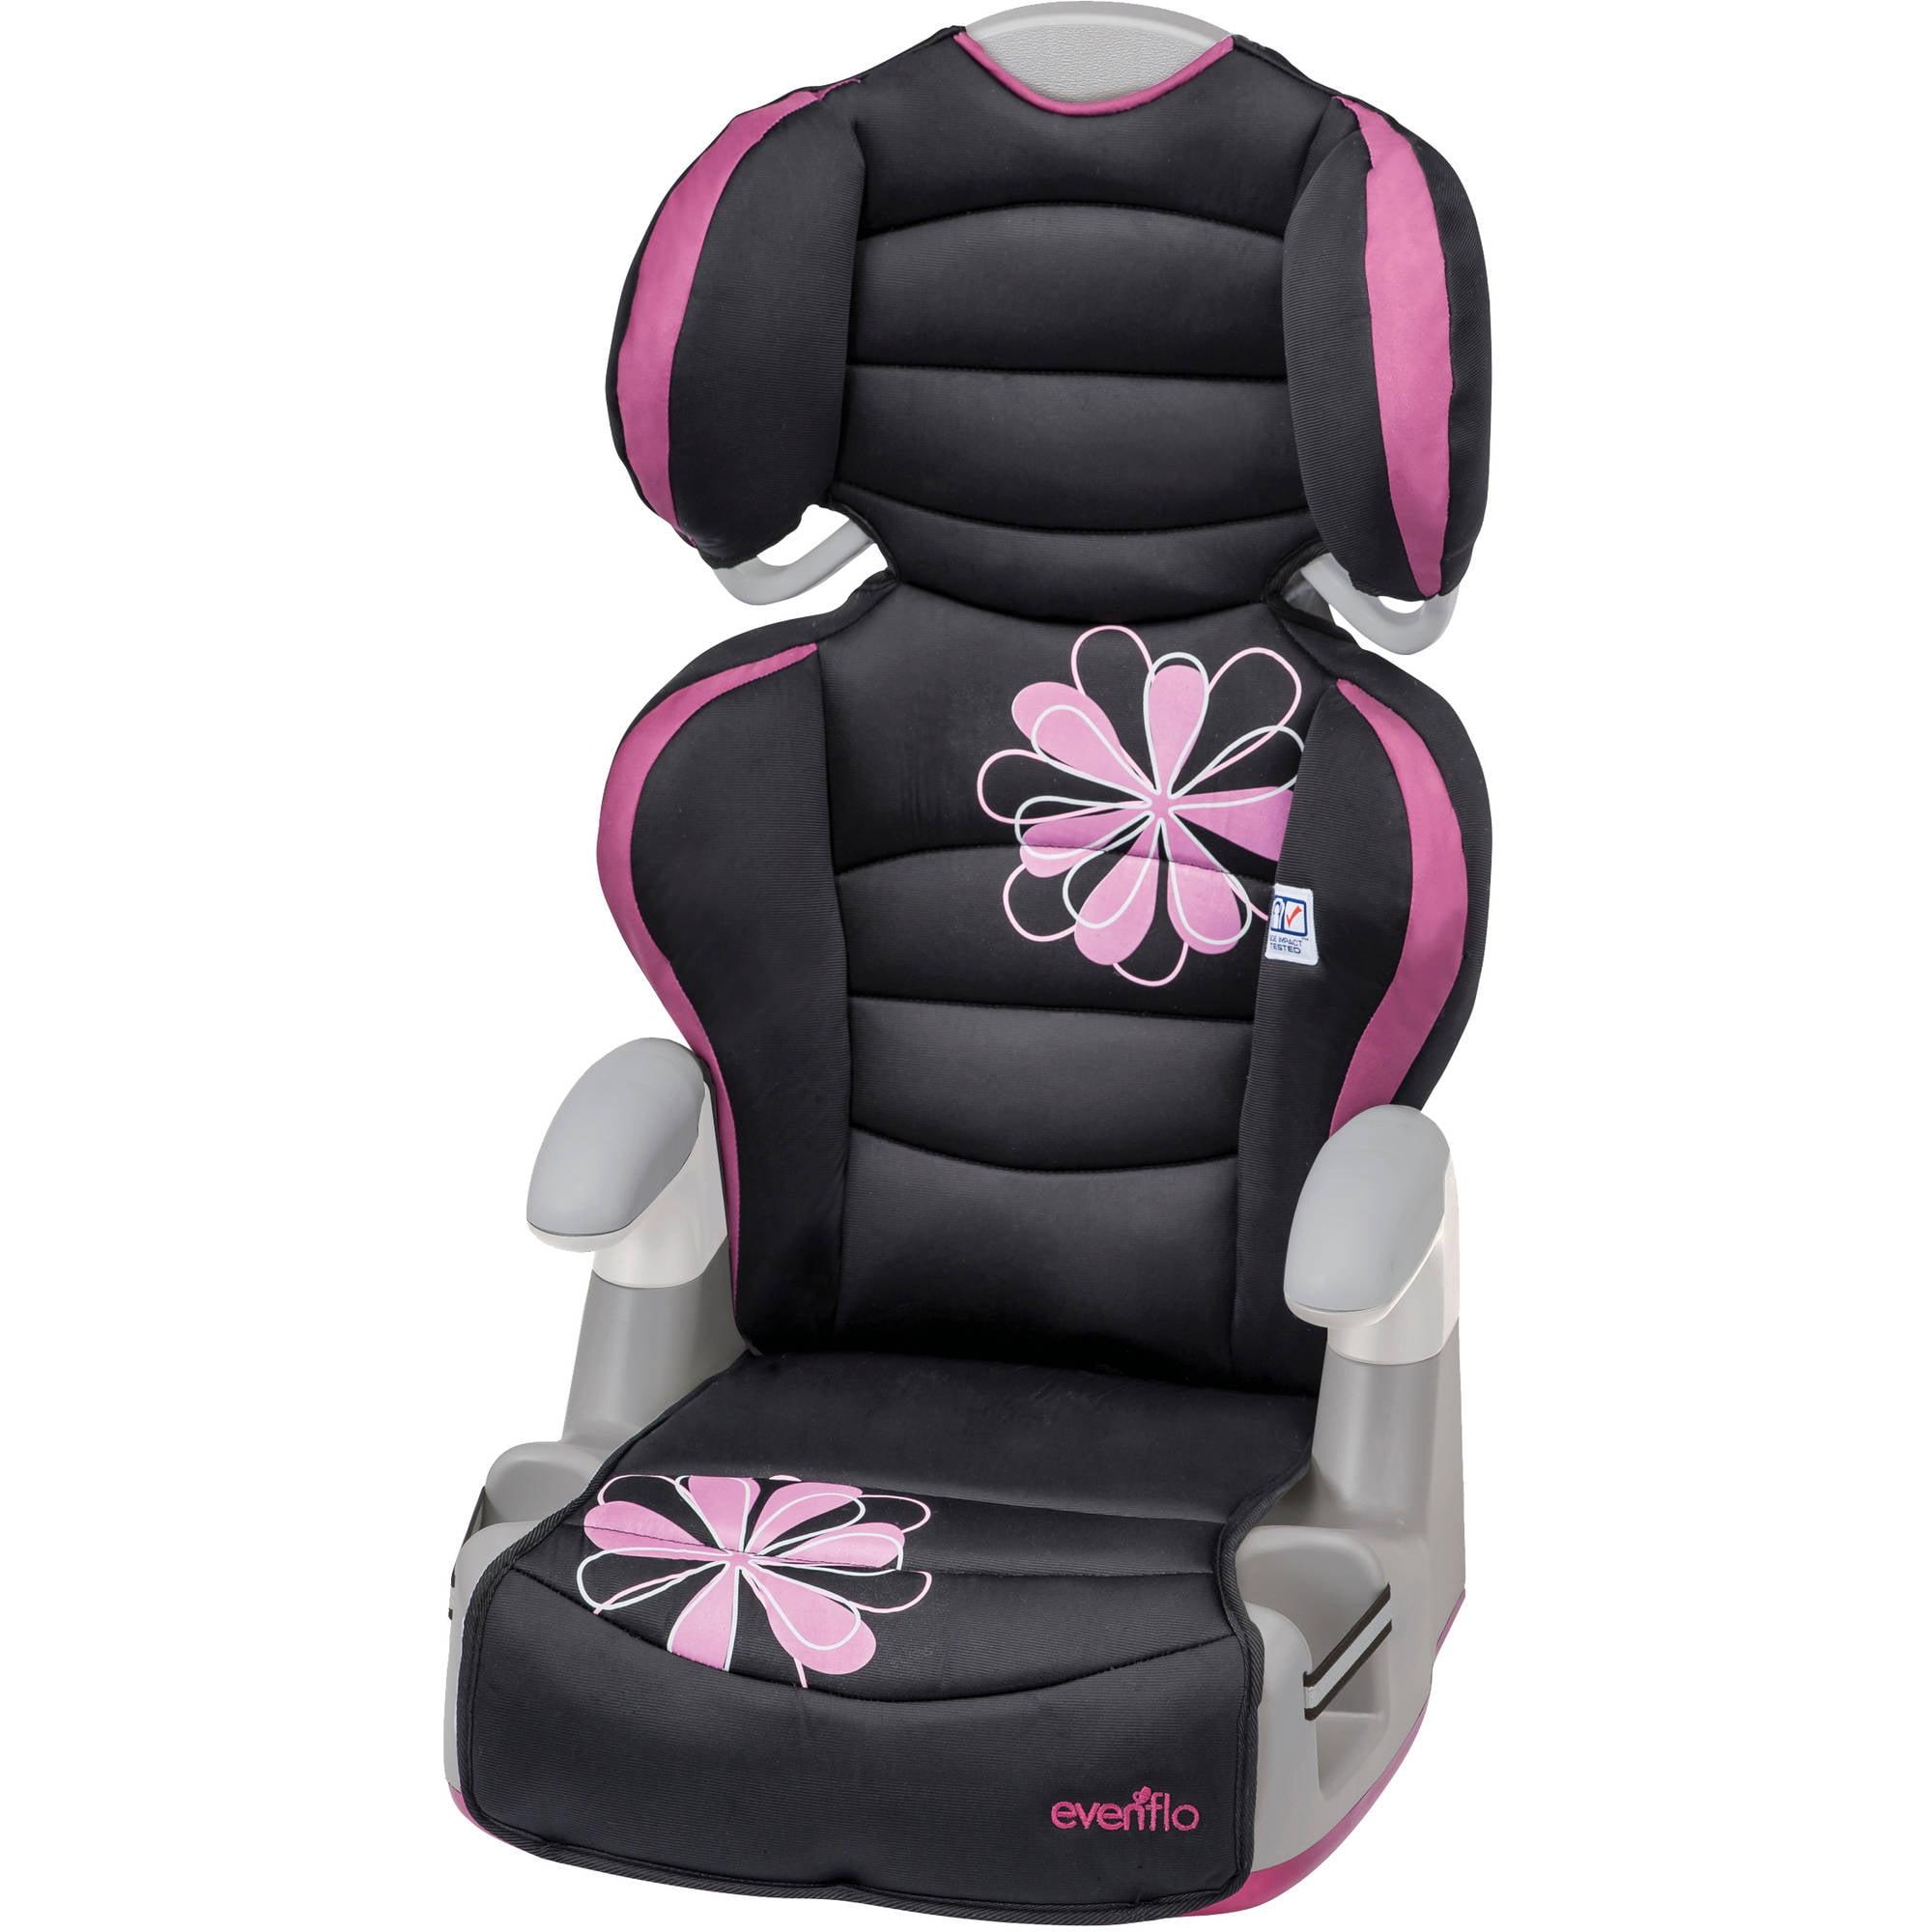 Evenflo Big Kid Amp Booster Car Seat, Carrissa